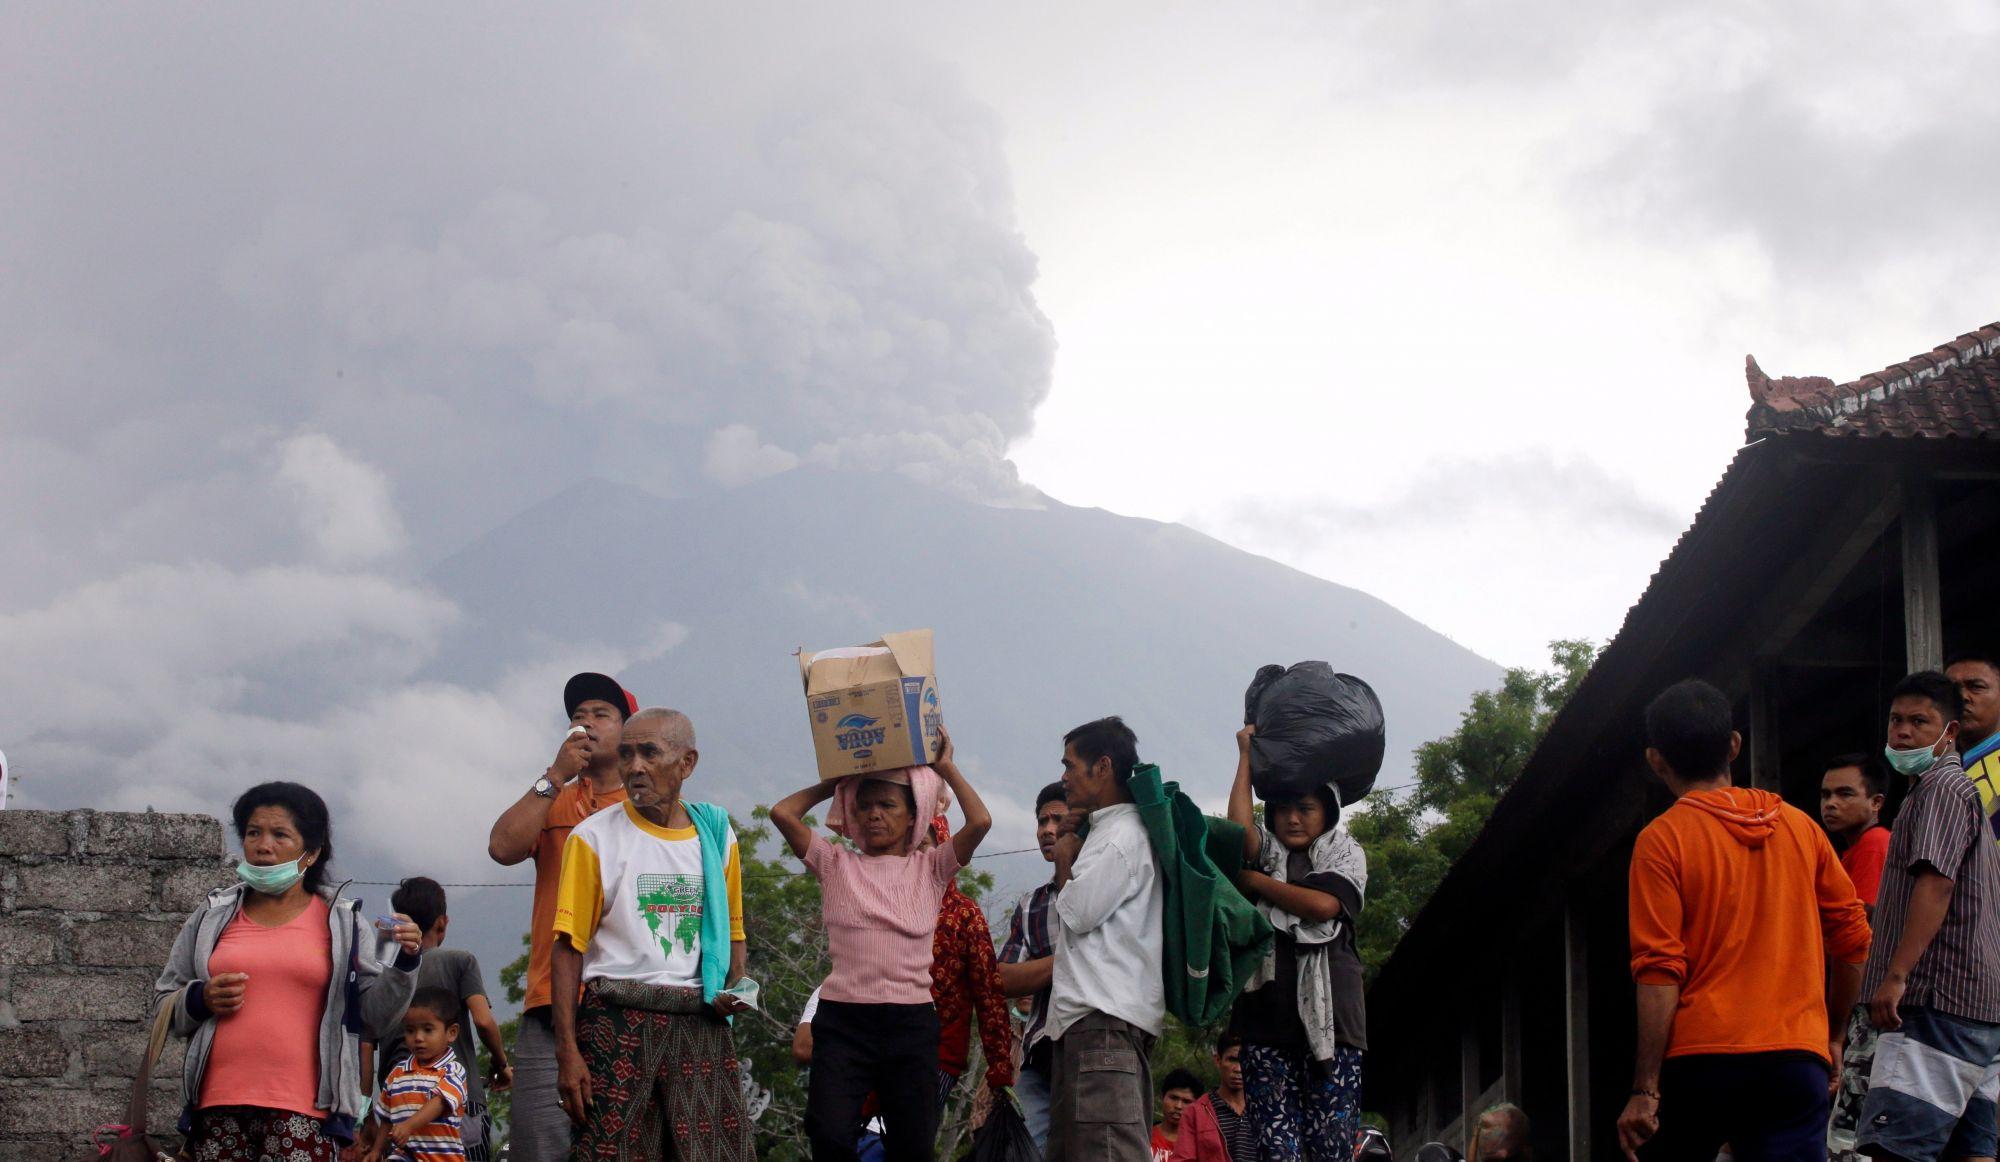 Virgin Australia : L'éruption du volcan Agung à Bali s'intensifie